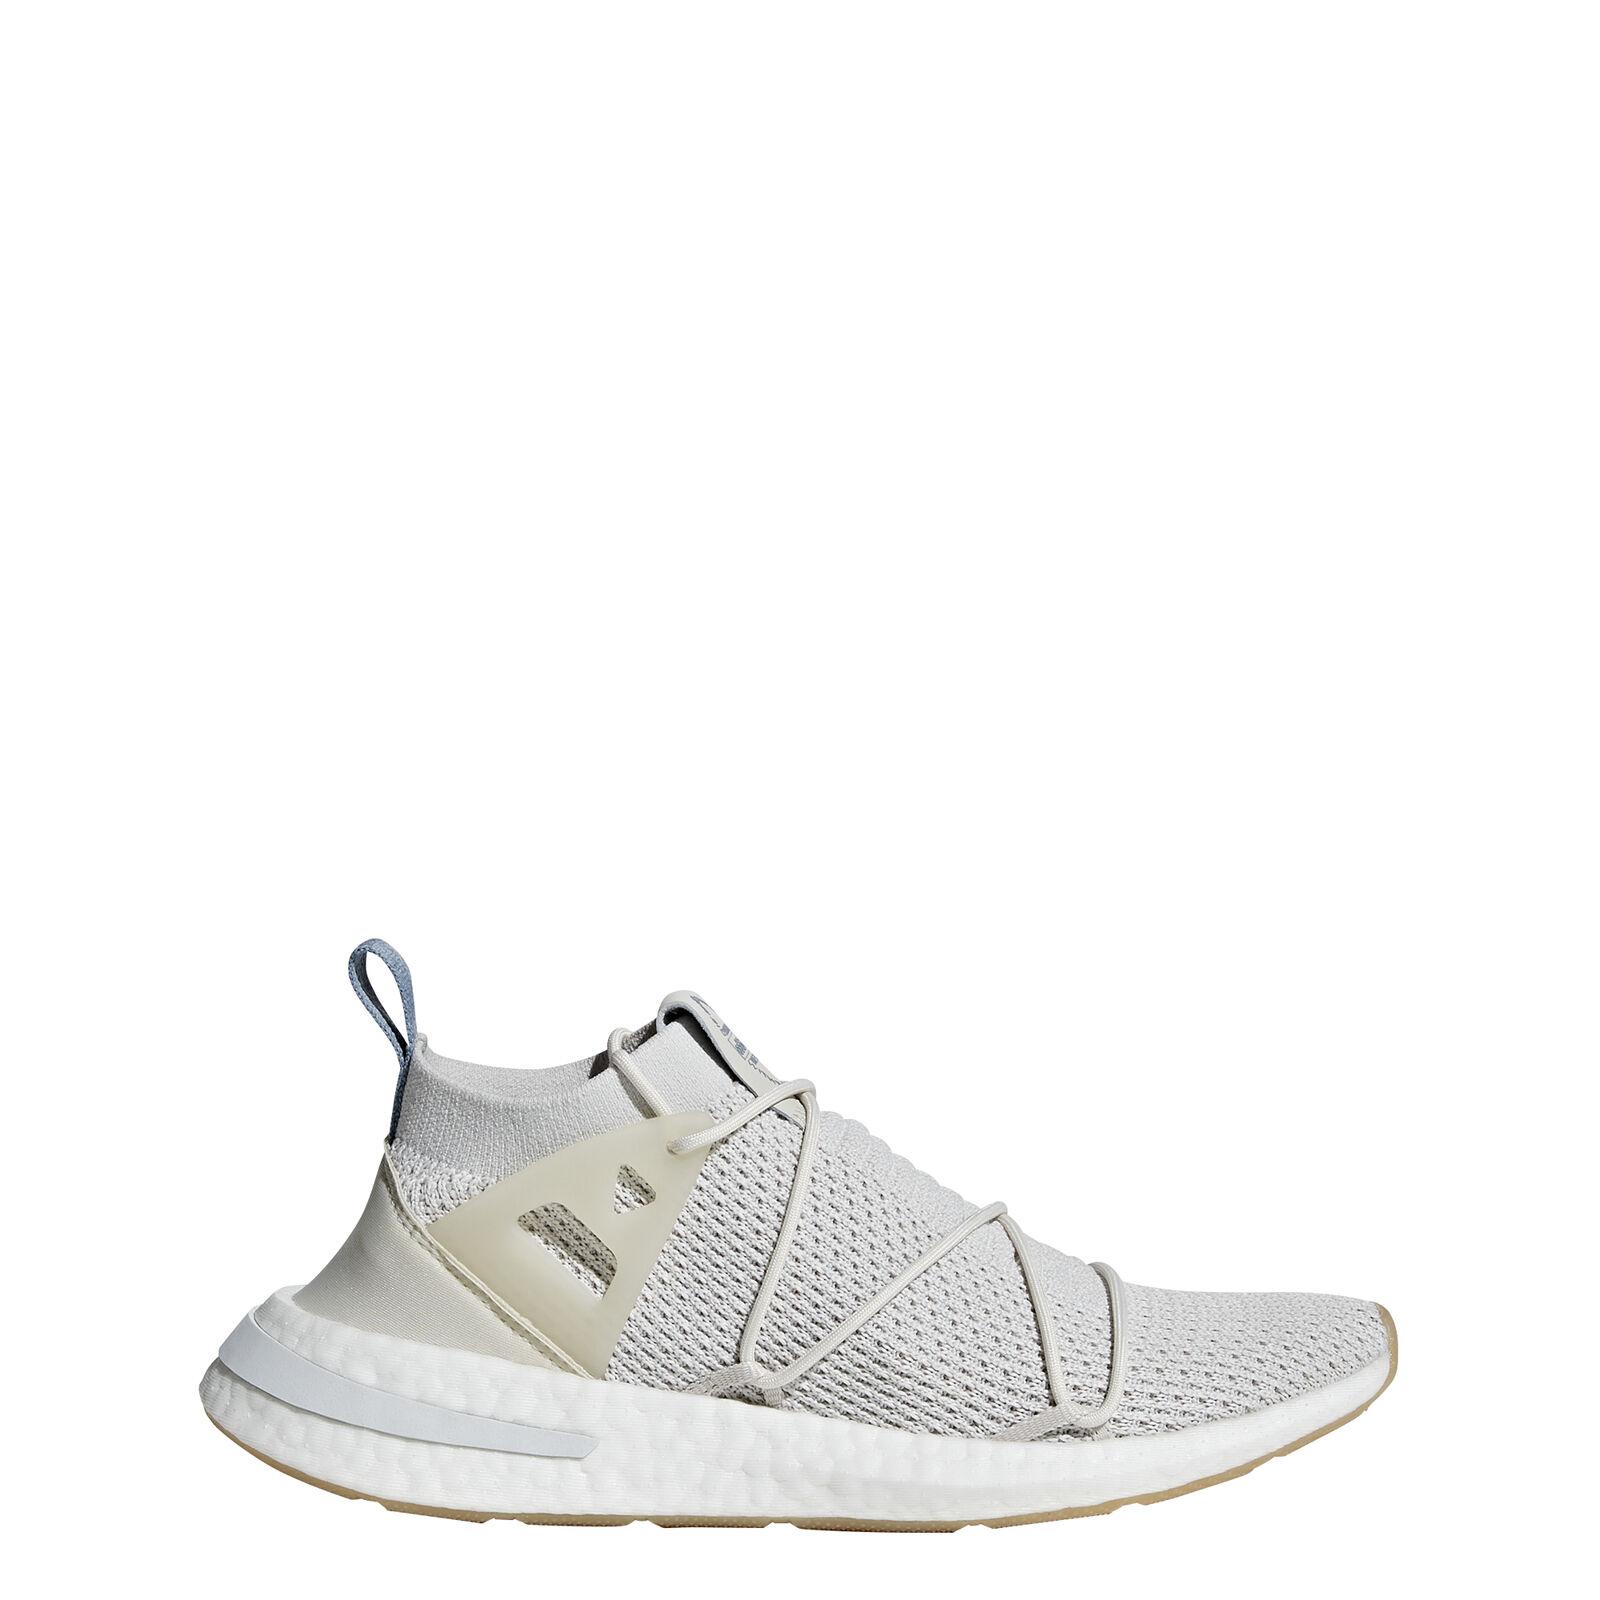 Adidas Schuhe Arkyn PK W Extrem schnelle Logistik